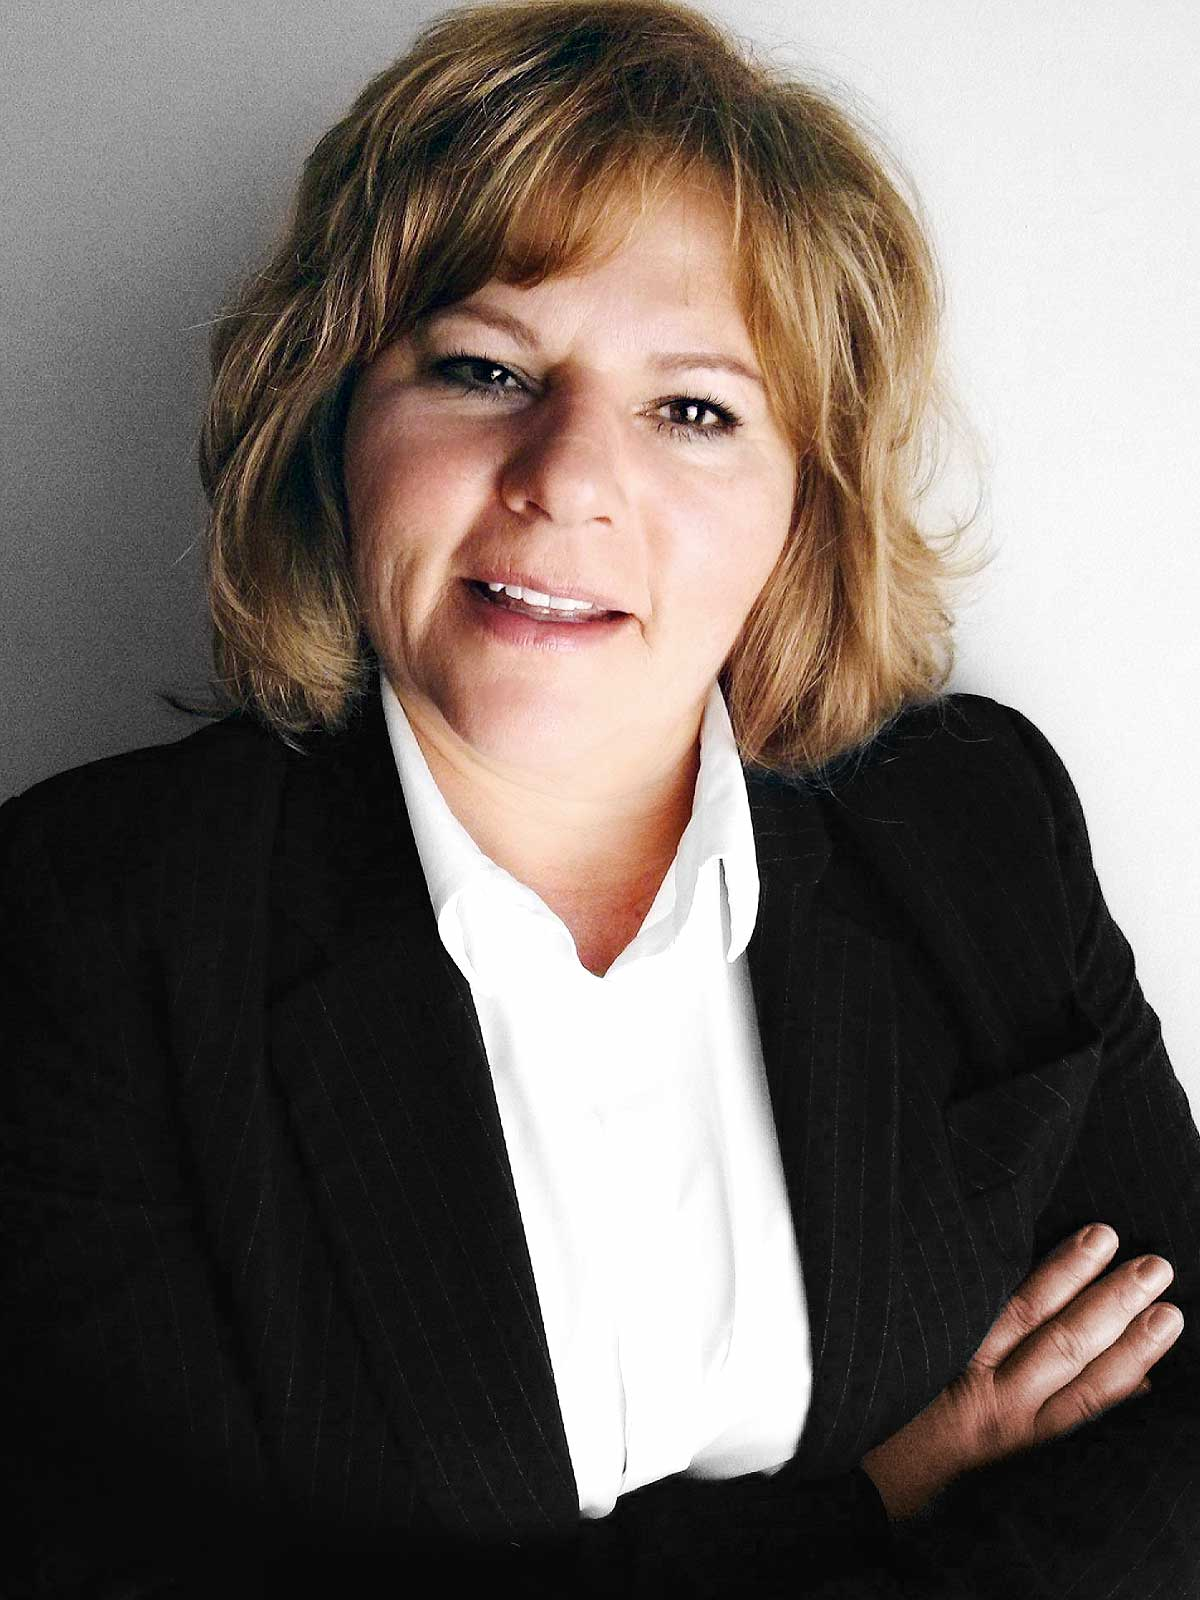 Suzan Stupack CEO Founder The Stak Co Winnipeg Manitoba Metis Entrepreneur Profile 1